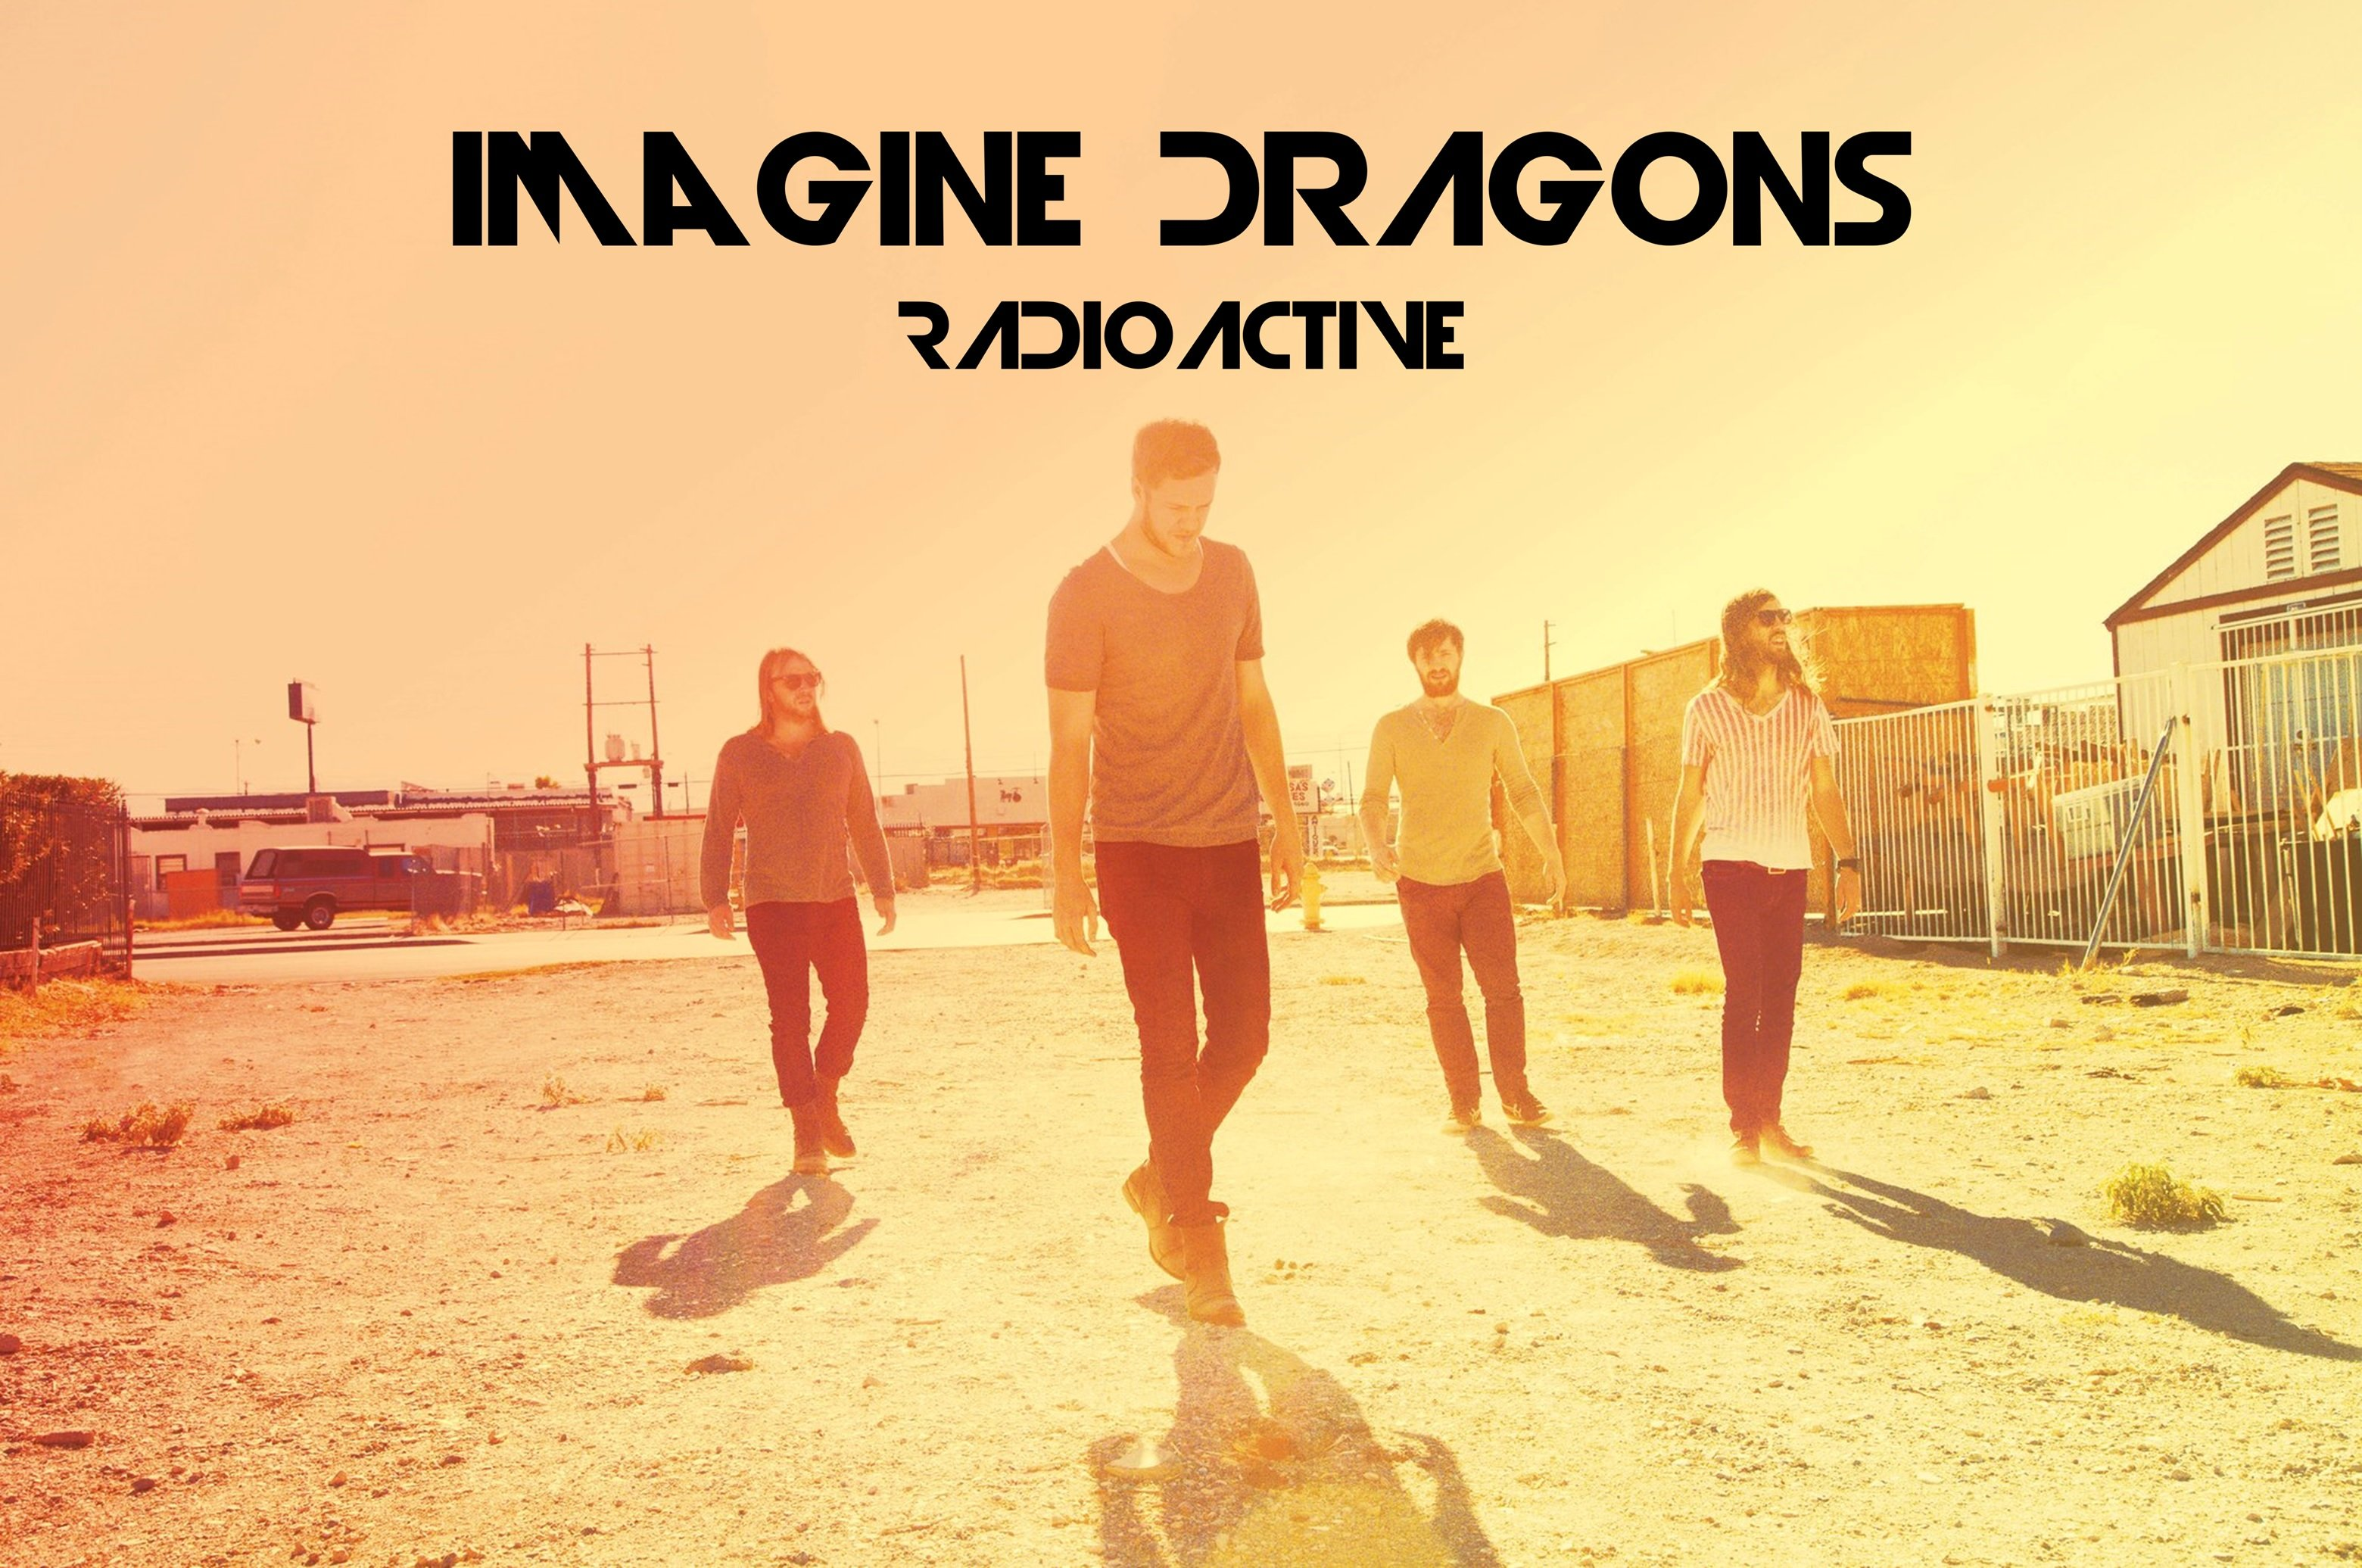 Imagine Dragons Alternative Electronic Rock Indie 31 Wallpaper